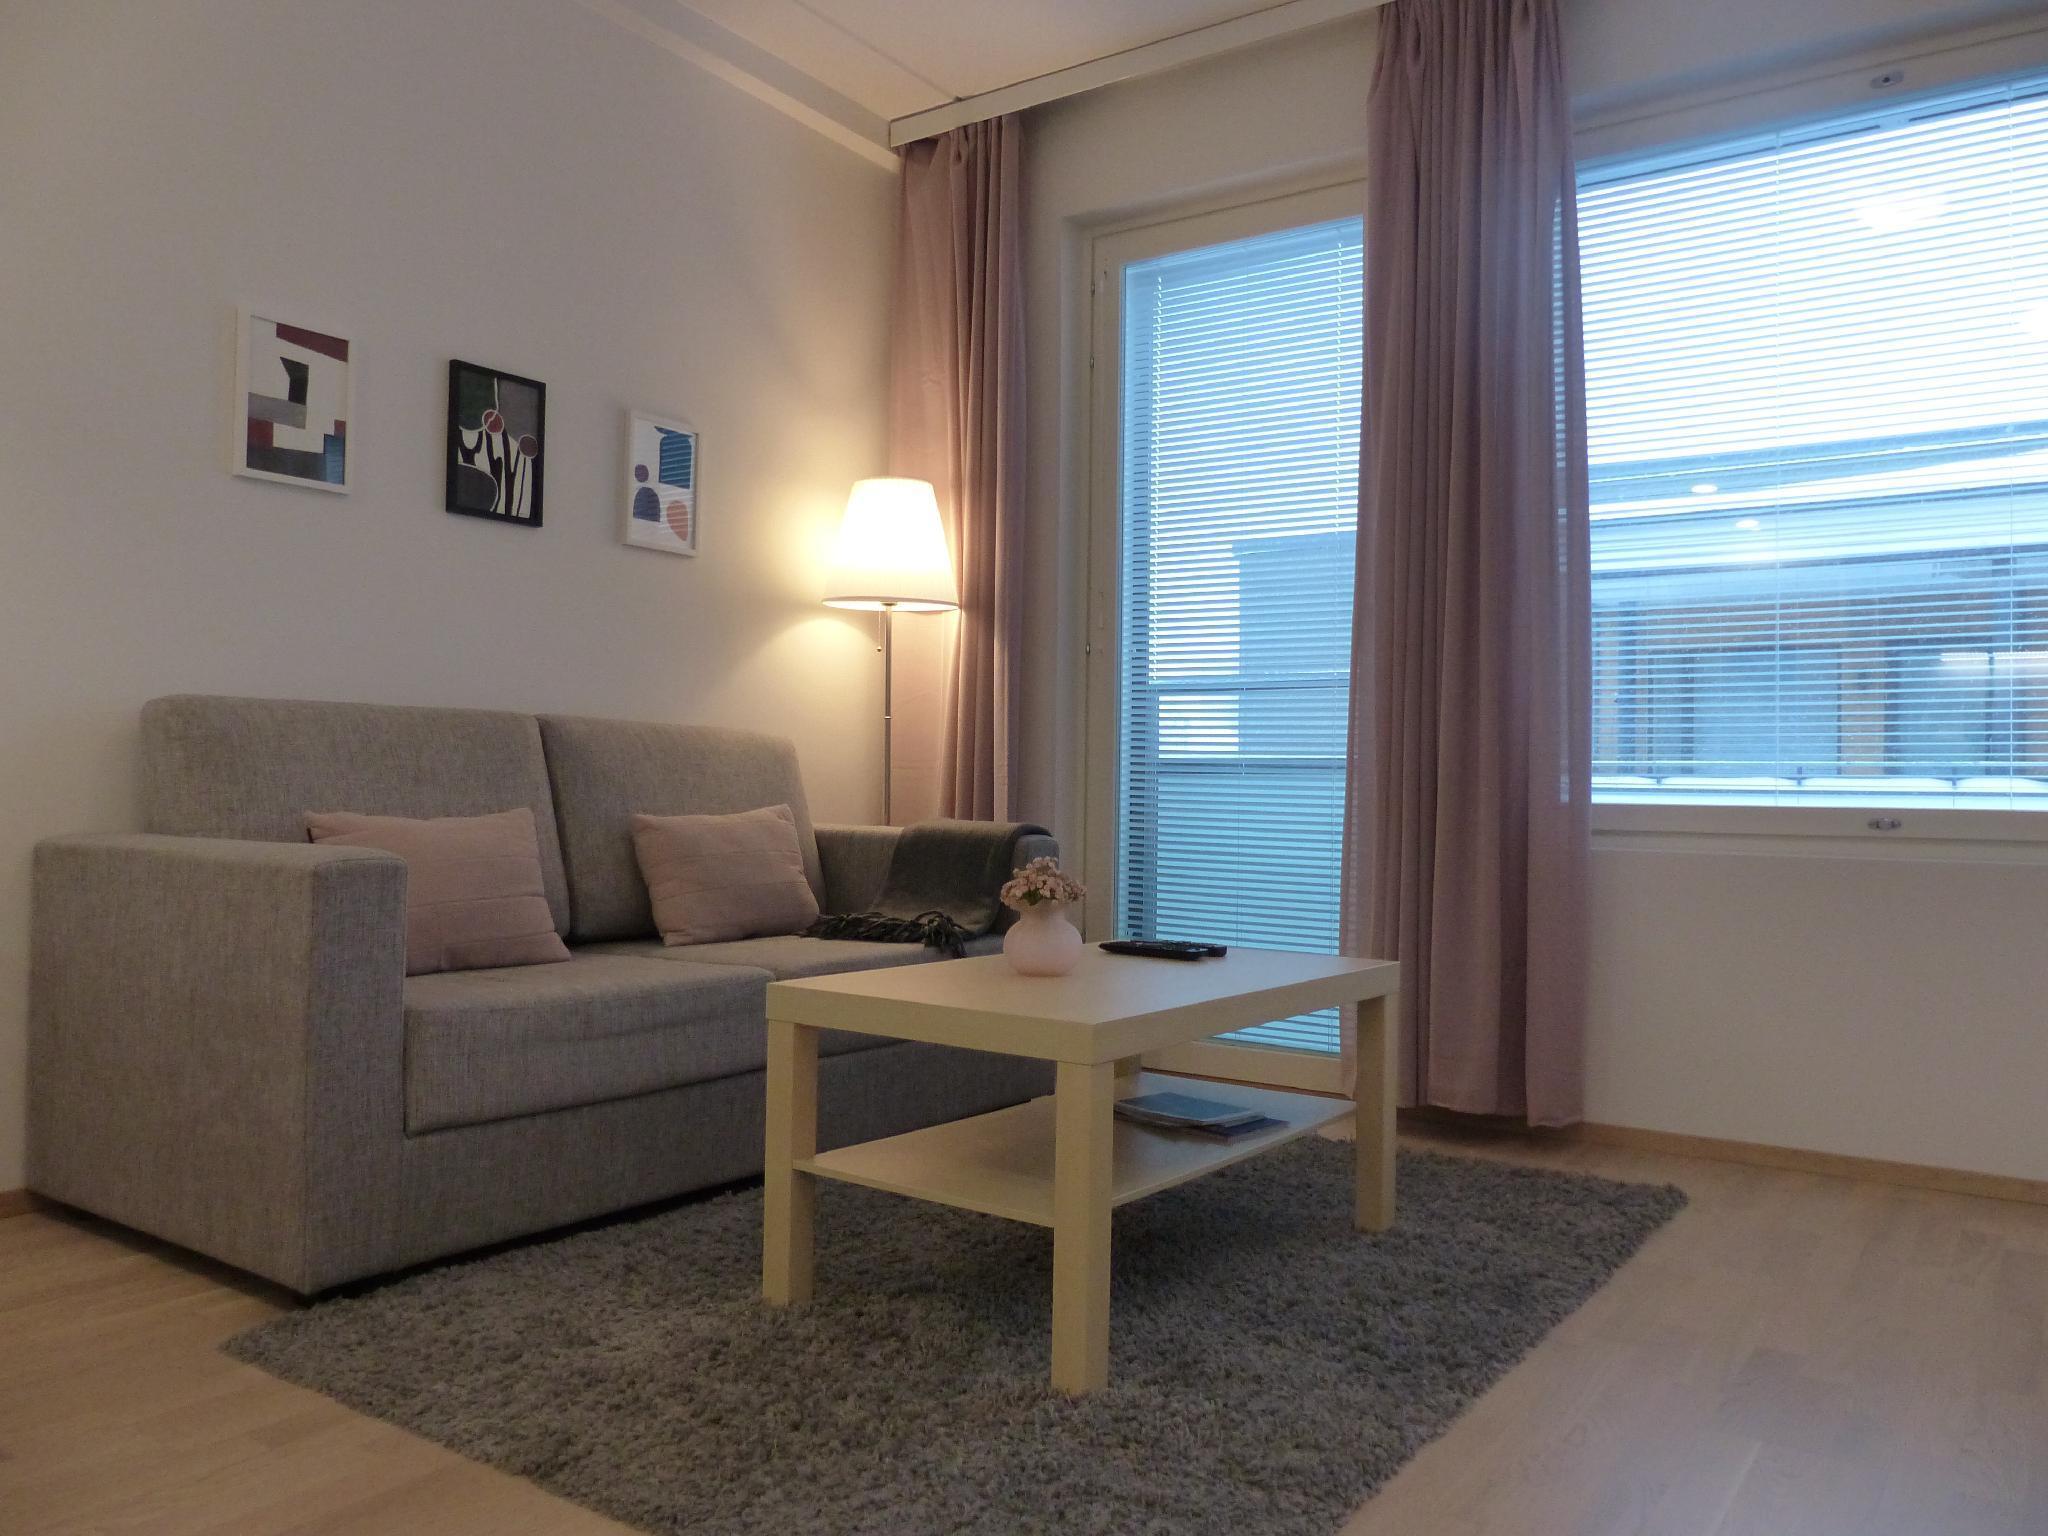 Westbay Inn apartment with sauna